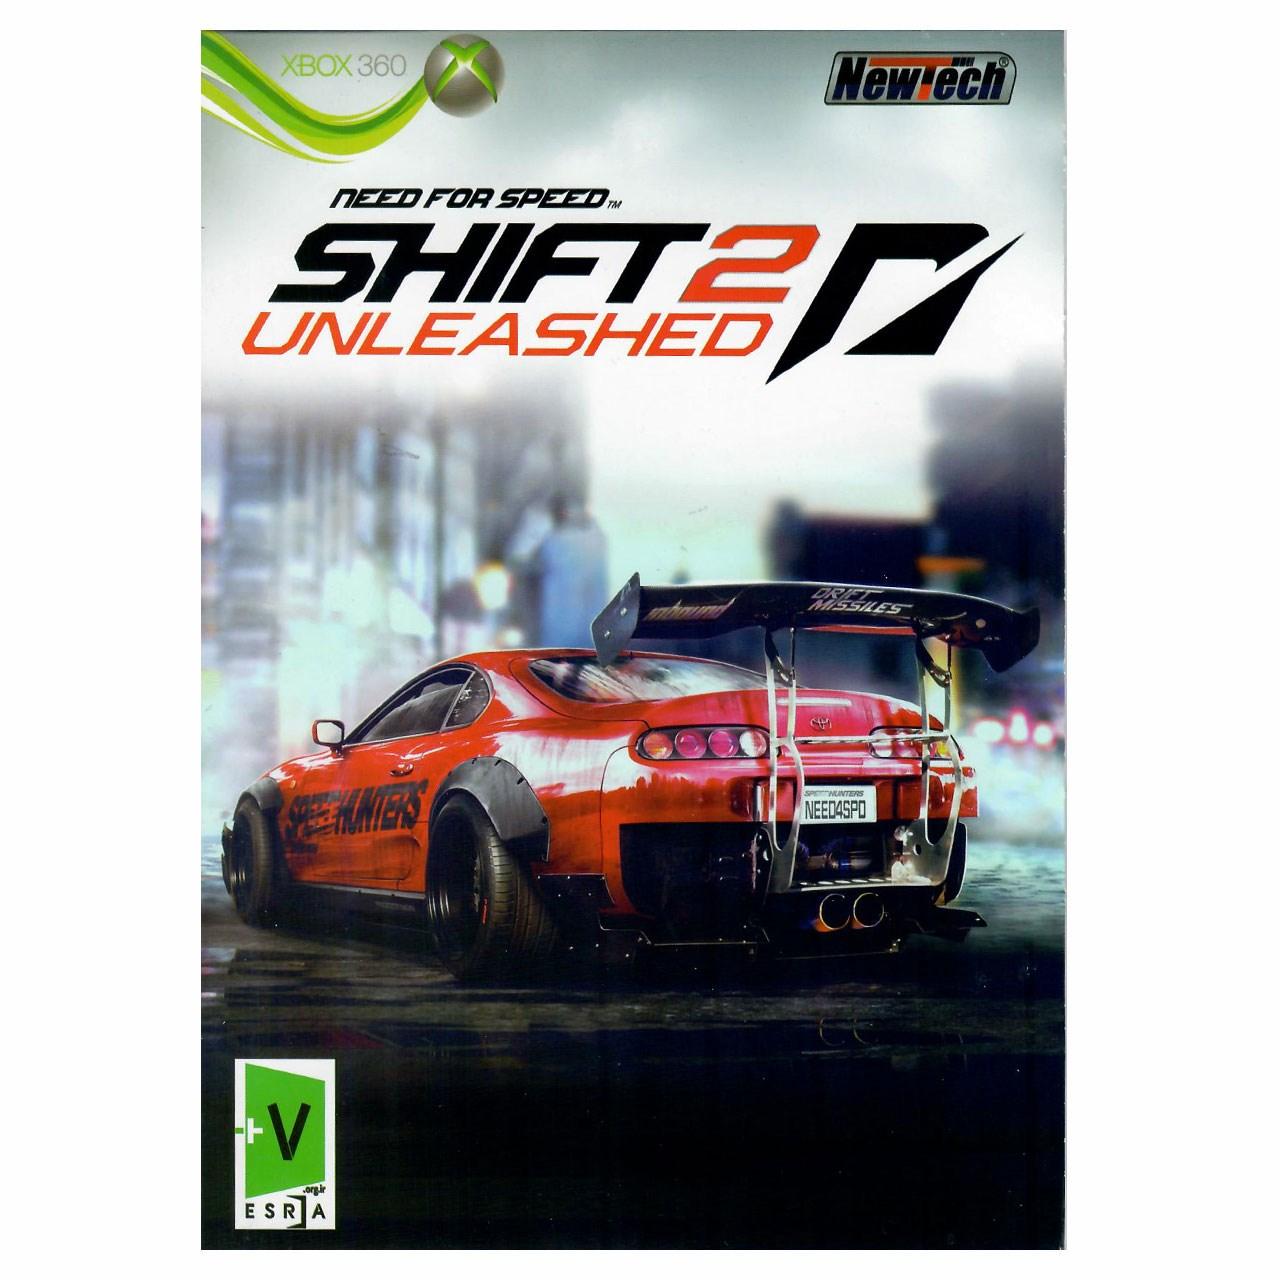 بازی Need For Speed Shift 2 Unleashed مخصوص ایکس باکس 360